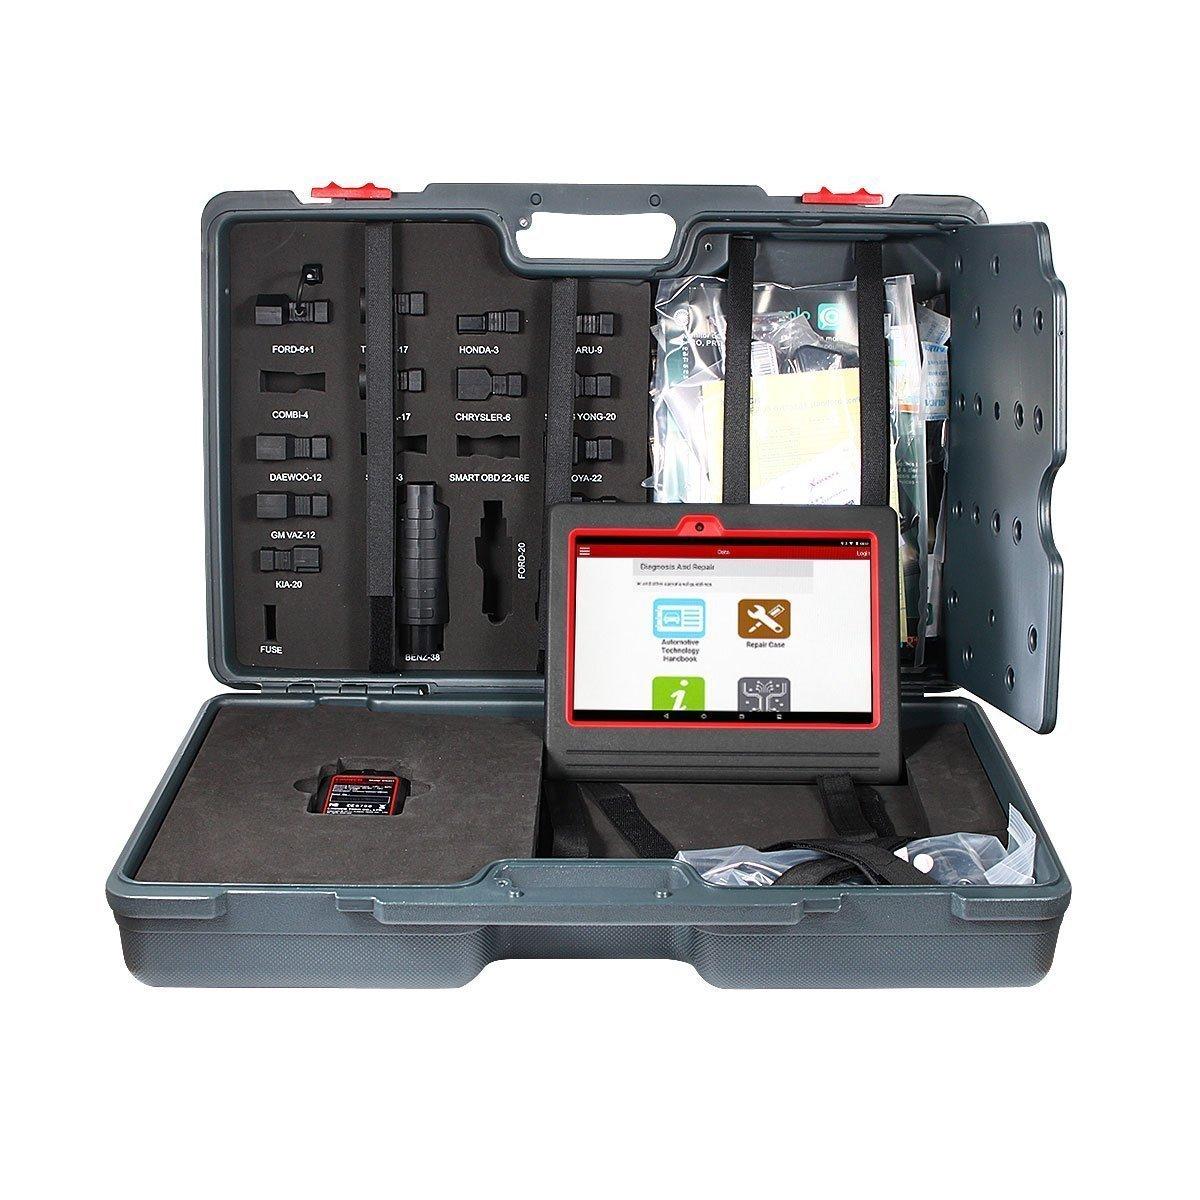 Borison LaunchX431V 8 故障診断機 全自動車モデルと全系統を診断 グローバル版 Wifi/Bluetooth 搭載タブレットシステム診断 スキャンツール  多車種対応 多言語(日本語含め)変換機能 アップデート オンライン一年品質年間保証 (X431 V8) B071F13HD9 X431 V8  X431 V8